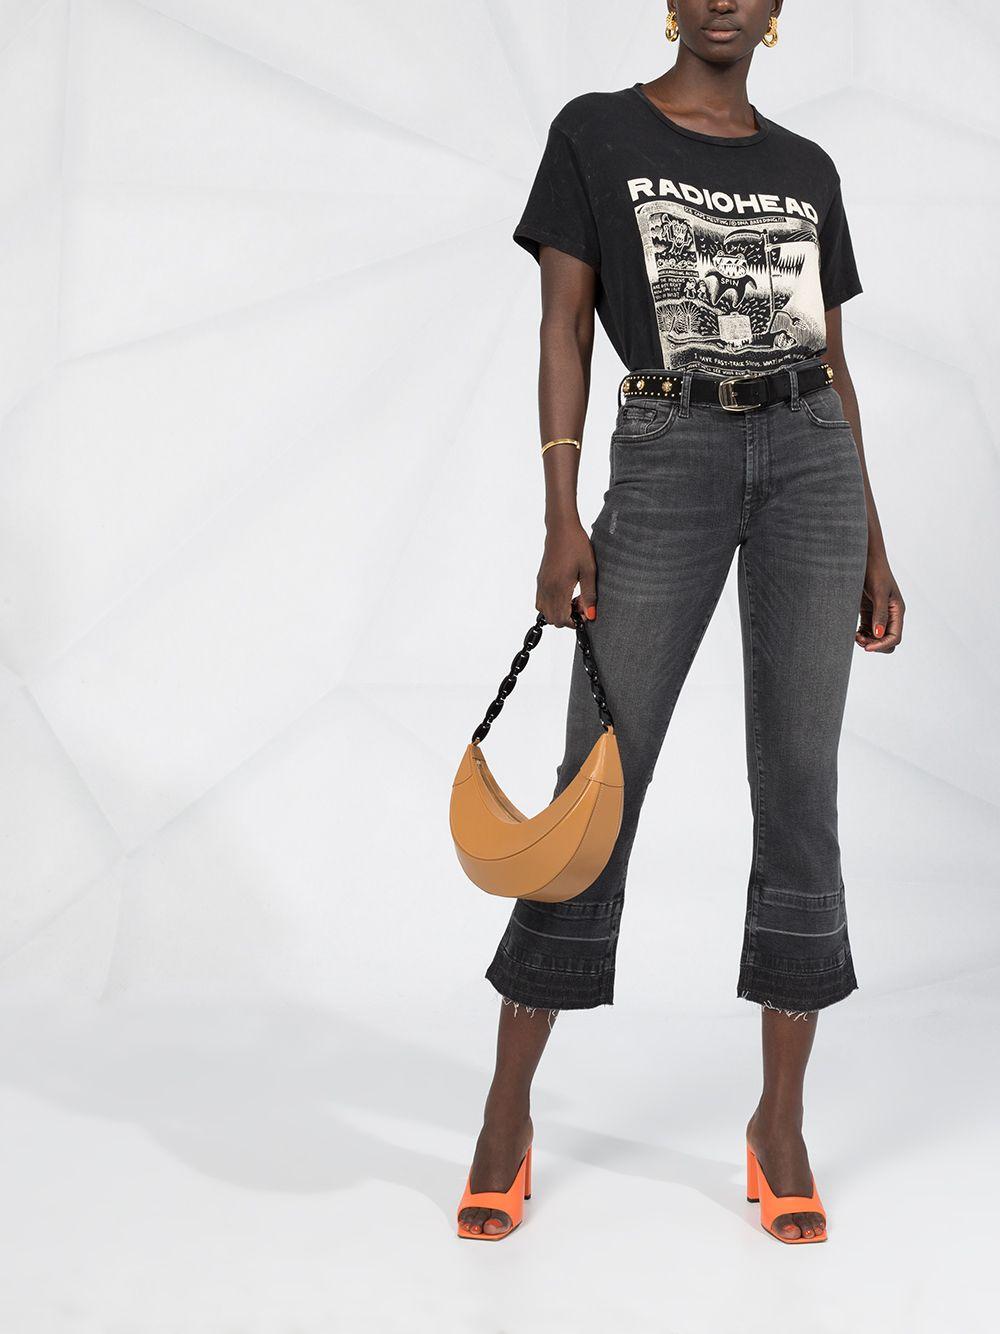 Jeans bootcut cropped Illusion in denim di cotone stretch nero con effetto sbiadito 7 FOR ALL MANKIND | Jeans | JSYRB260SE-CROPPED BOO UNROLLETBLACK